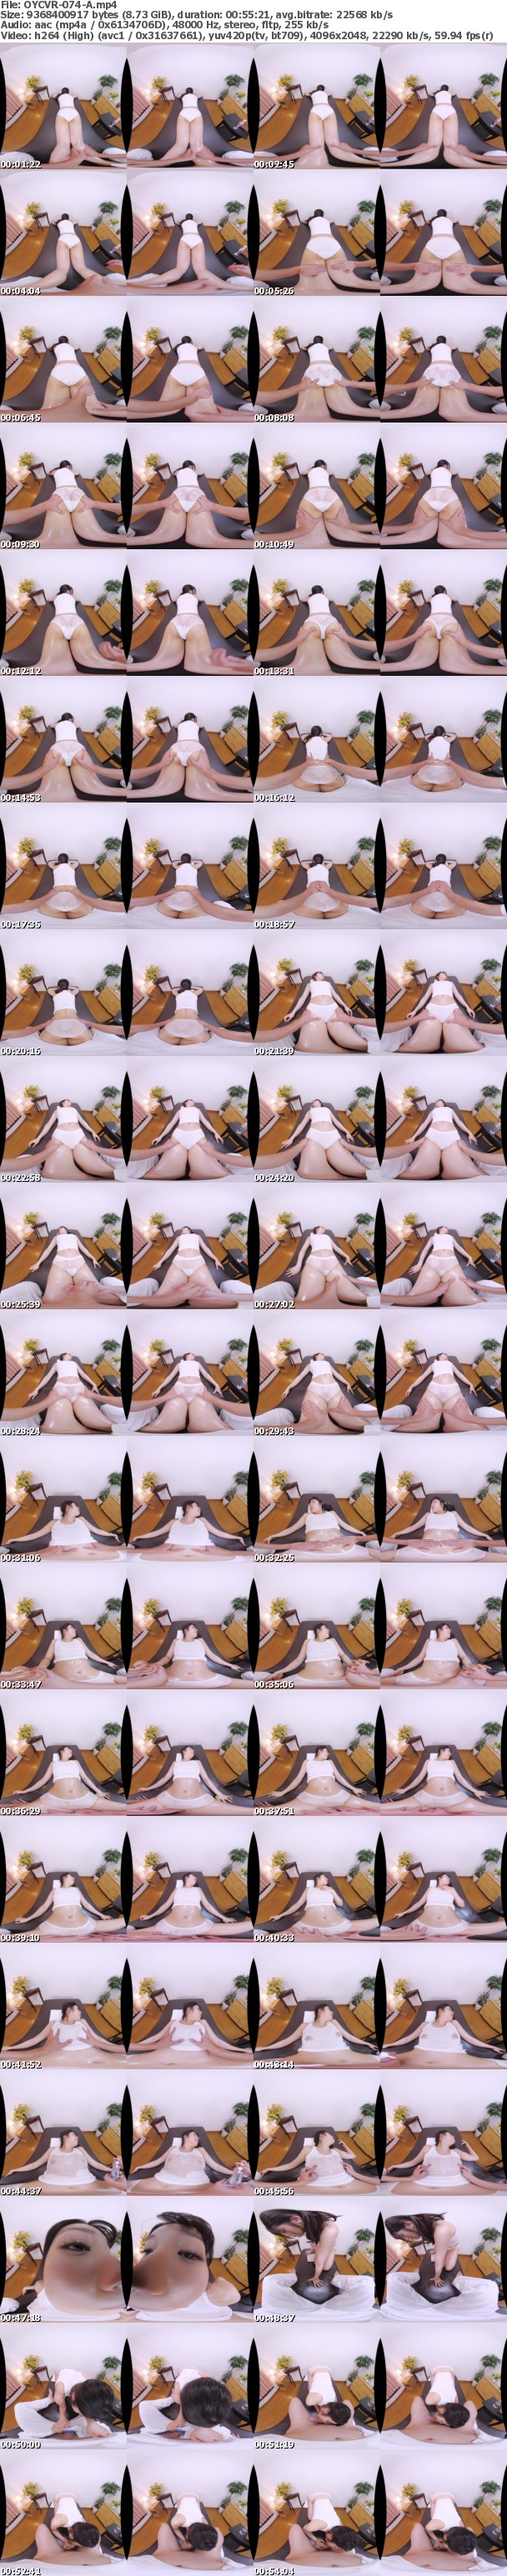 (VR) OYCVR-074 下向き特化!自宅で細々と経営するオイルマッサージ店にやってきたのは、オイルを塗っただけで自分から際どいところギリギリを求めて腰が動いちゃう欲求不満の超敏感奥様!?そんなつもりは全くなかったのに、うっとりした目で自分から触られに来る美形奥様にガマン…